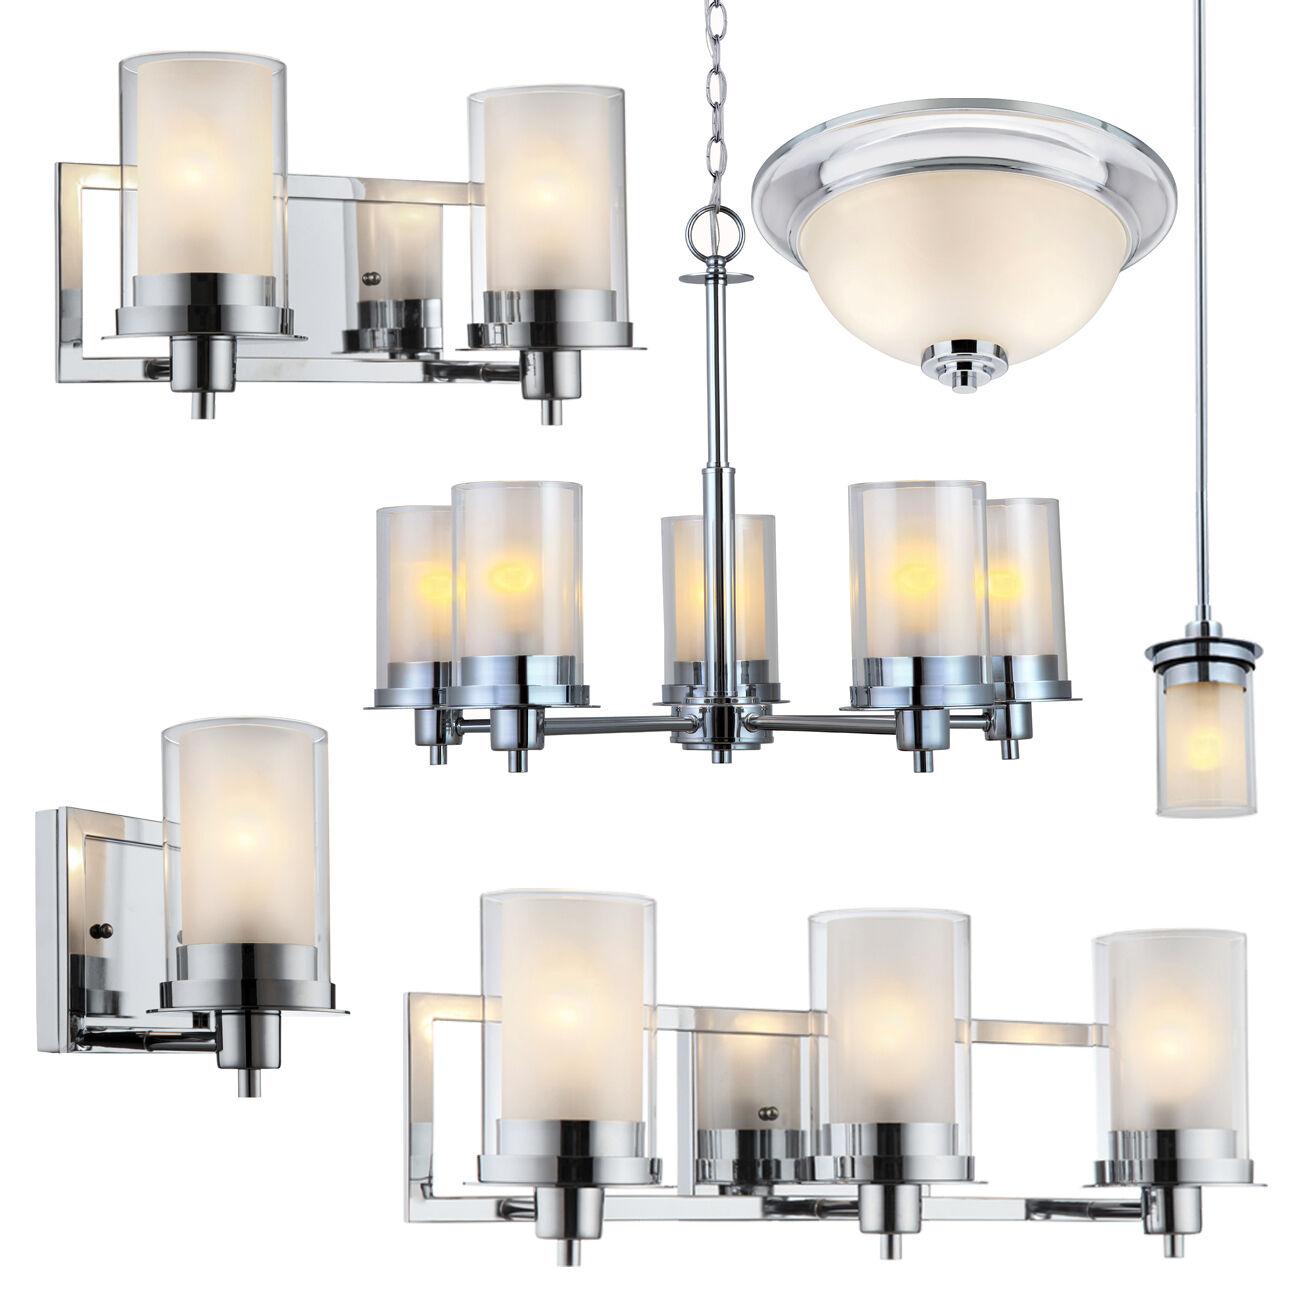 avalon polished chrome bathroom vanity ceiling lights